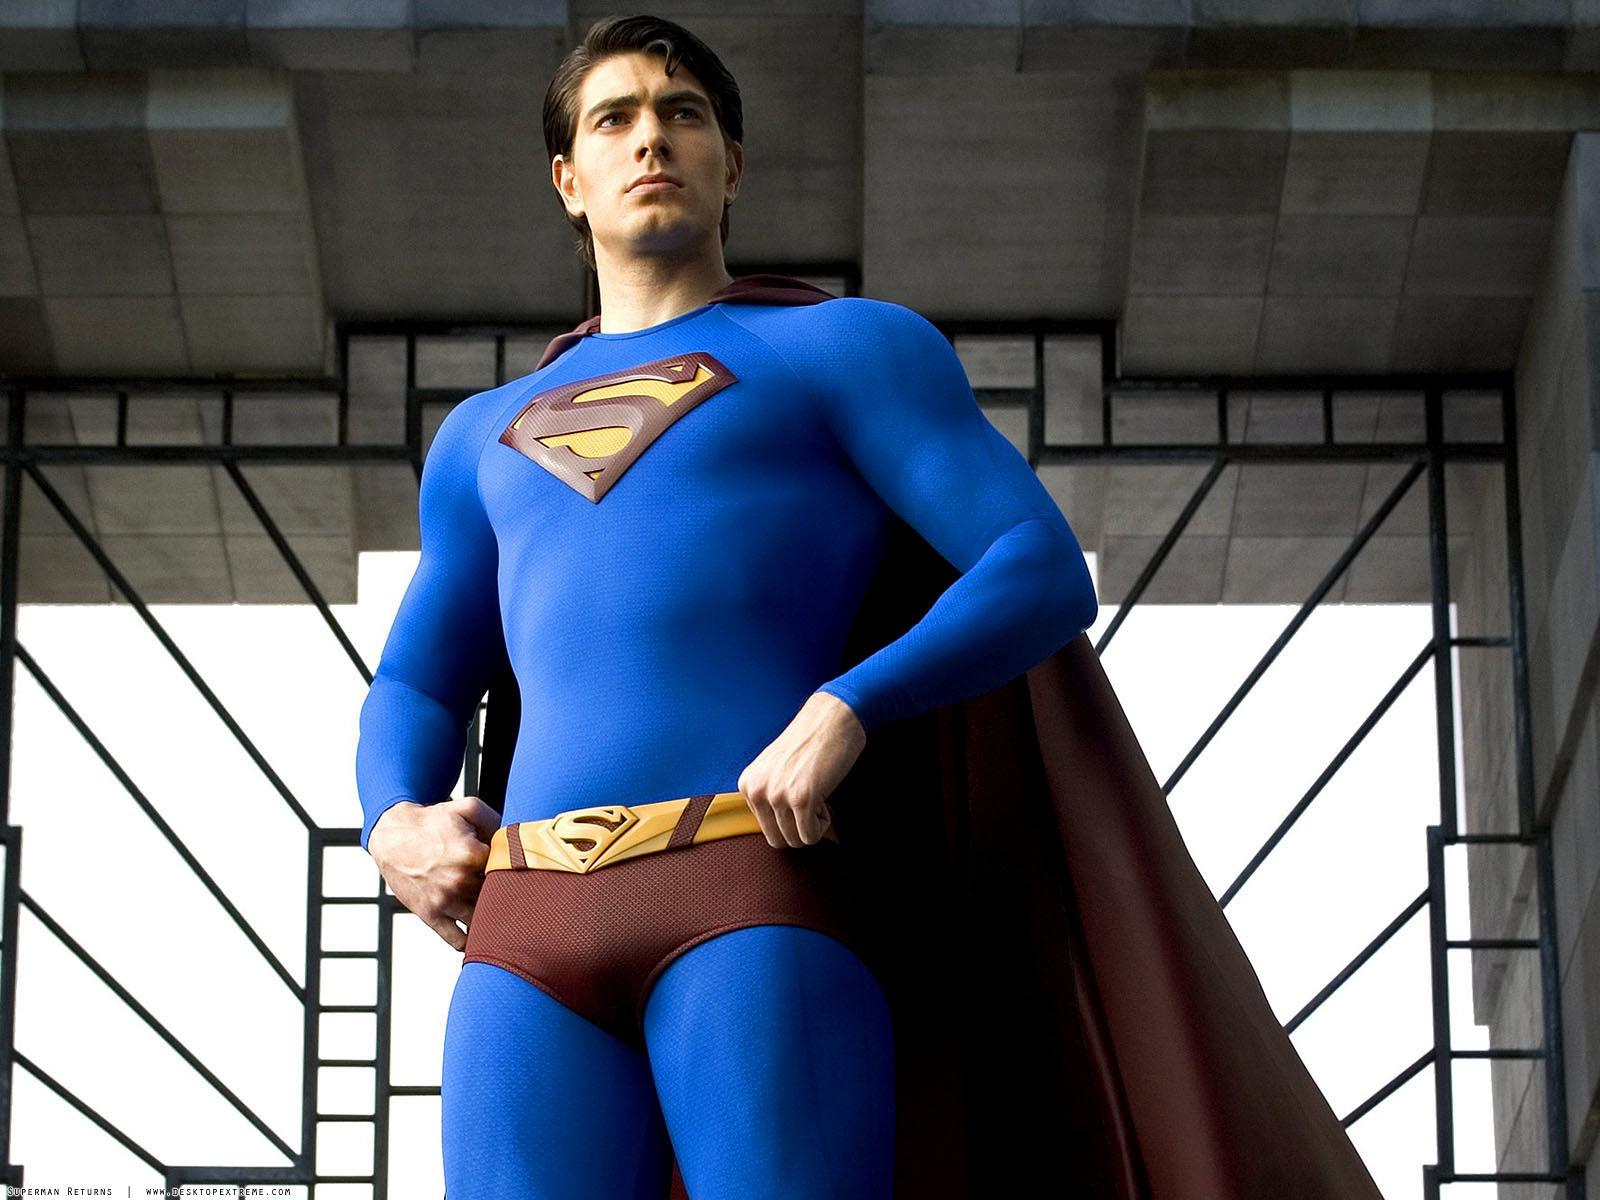 brogan superman 20 Things You Didn't Know About Sean Penn